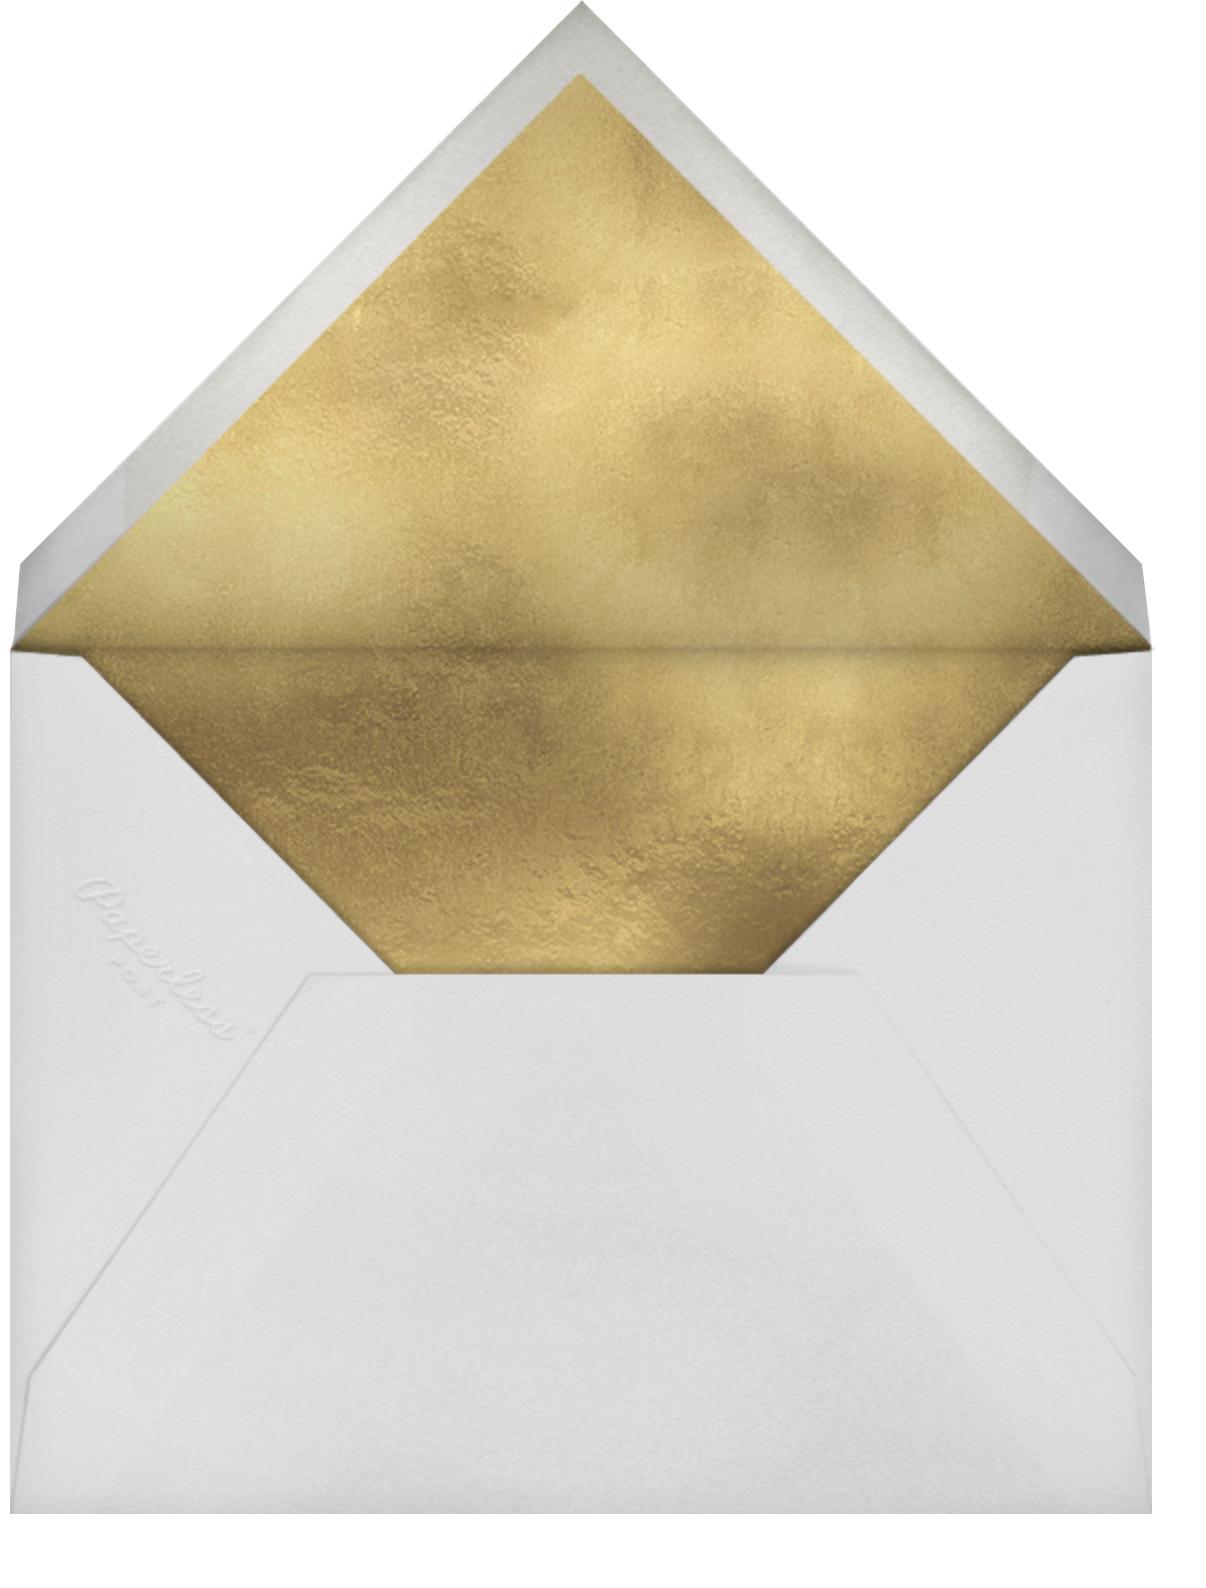 Flowering Mimosa - Navy - Oscar de la Renta - General entertaining - envelope back